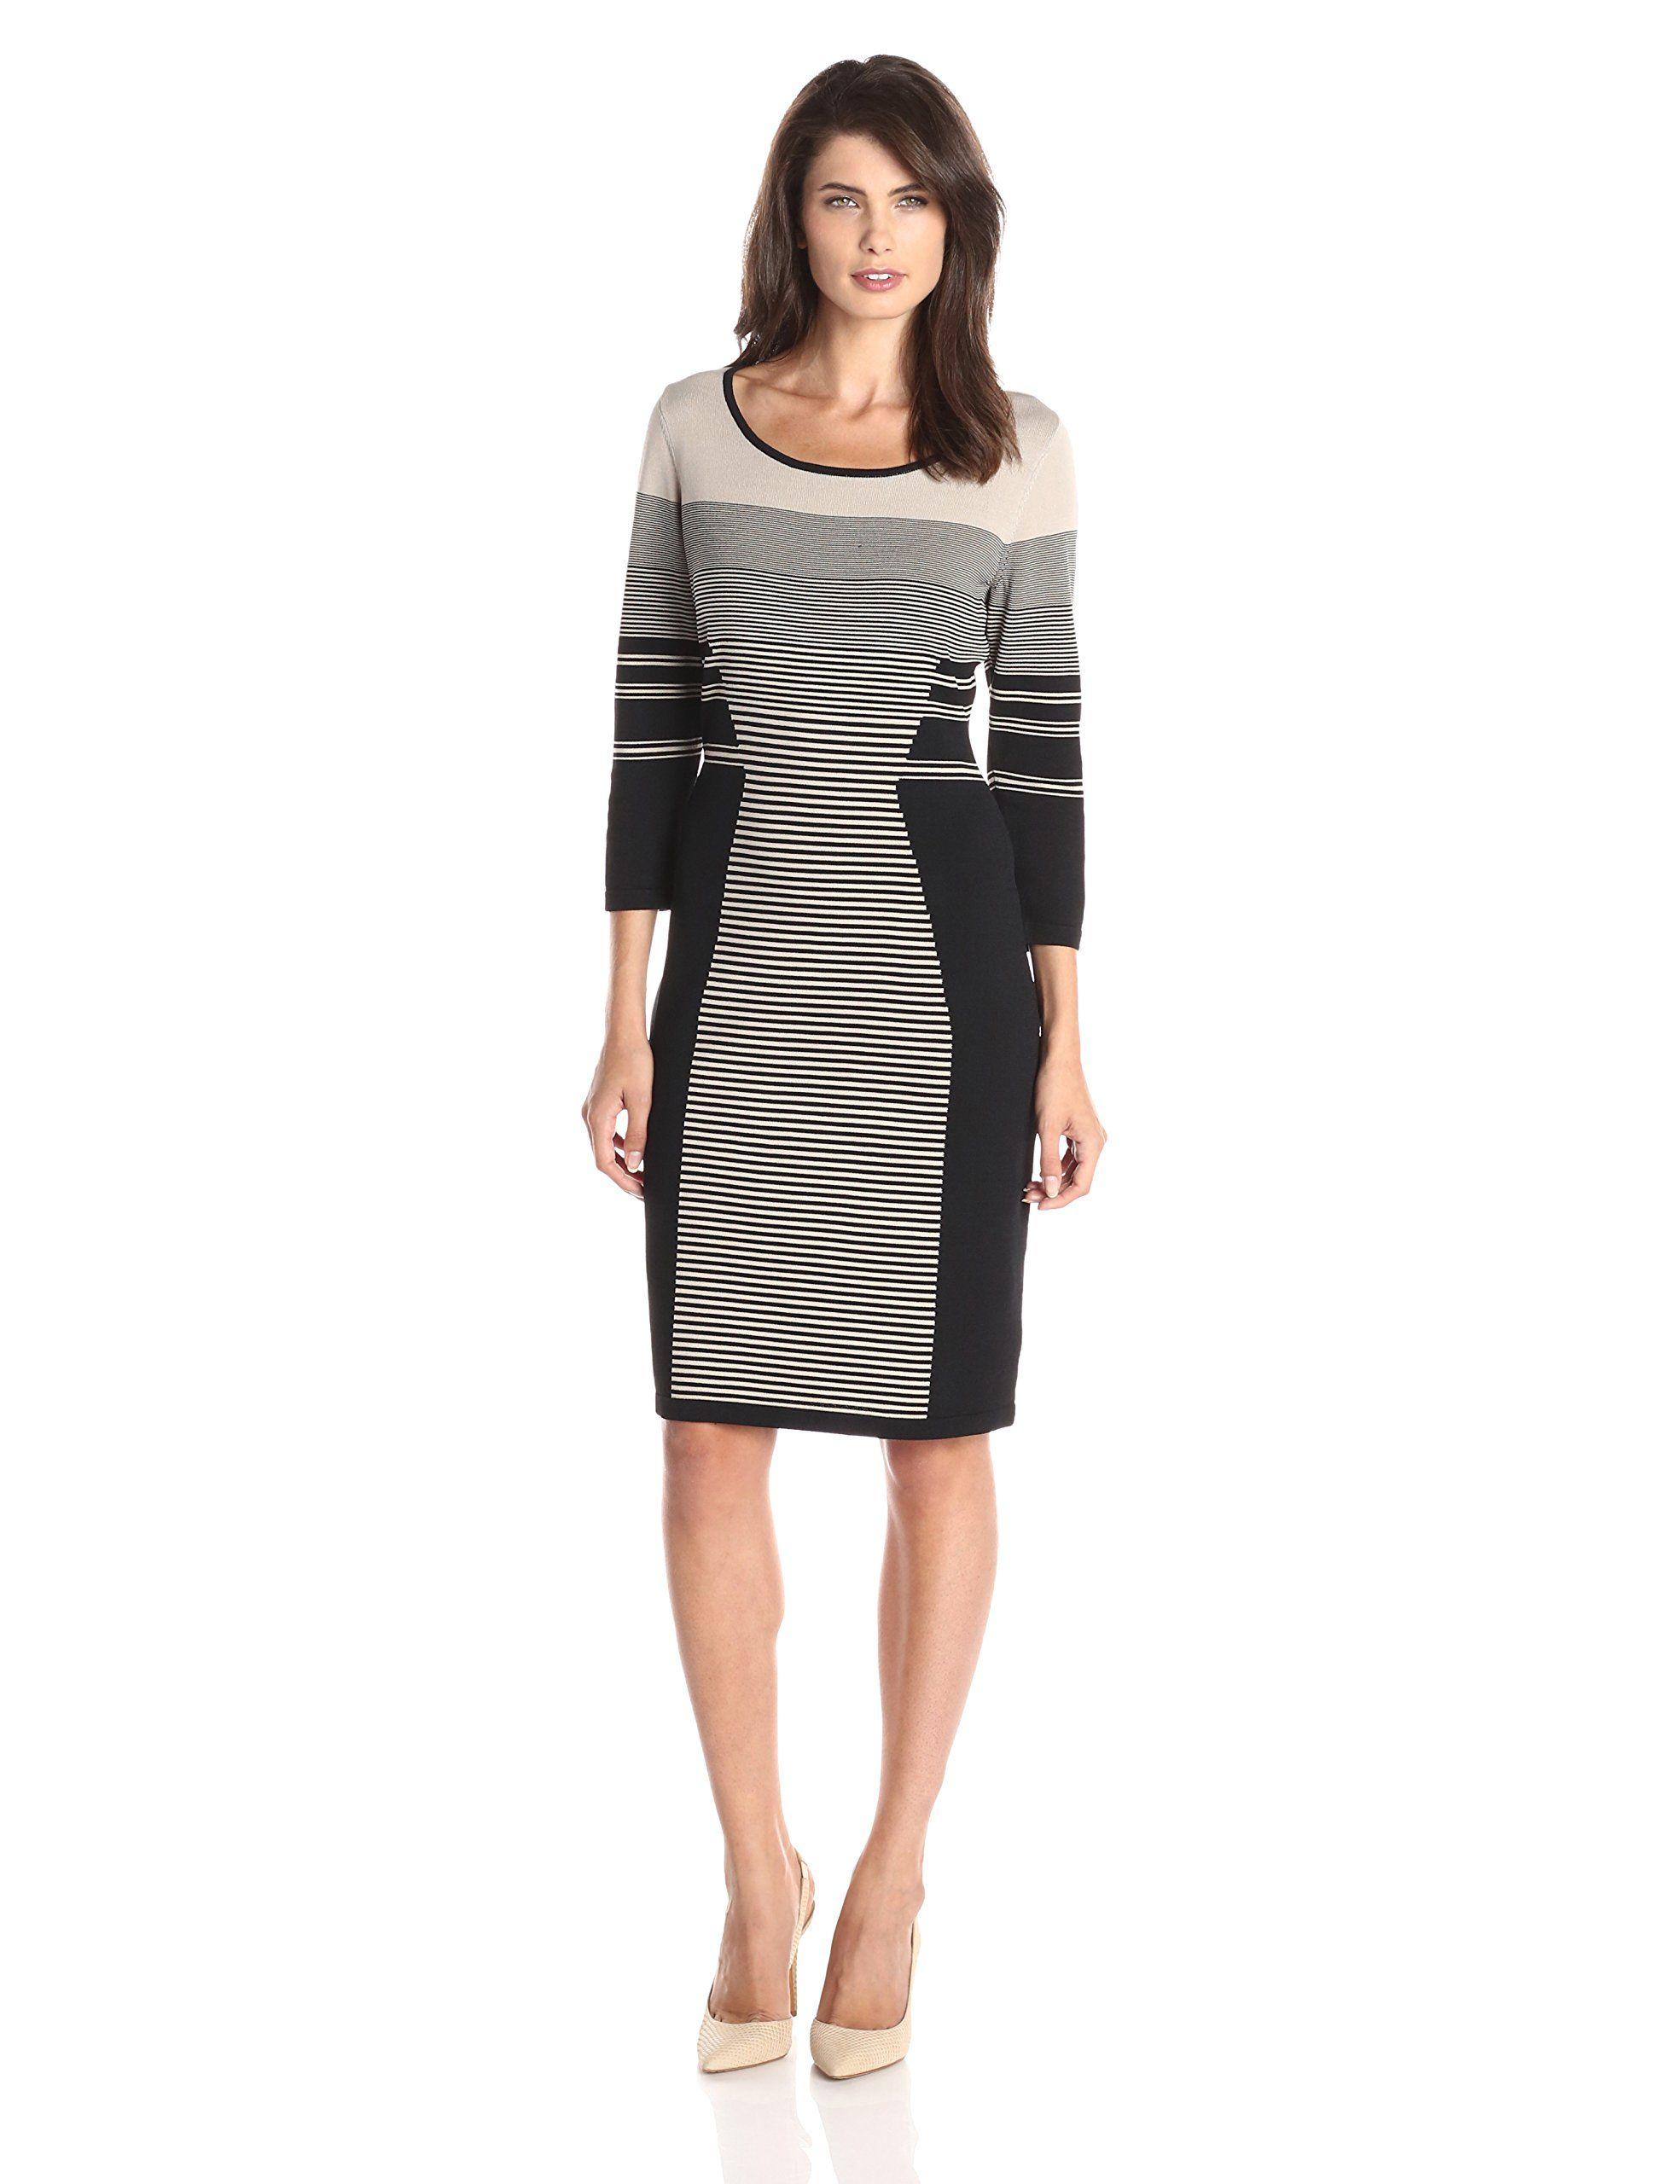 Calvin Klein Women S Long Sleeve Mixed Stripe Dress Casual Dresses For Women Women Long Sleeve Casual Dress Outfits [ 2560 x 1969 Pixel ]